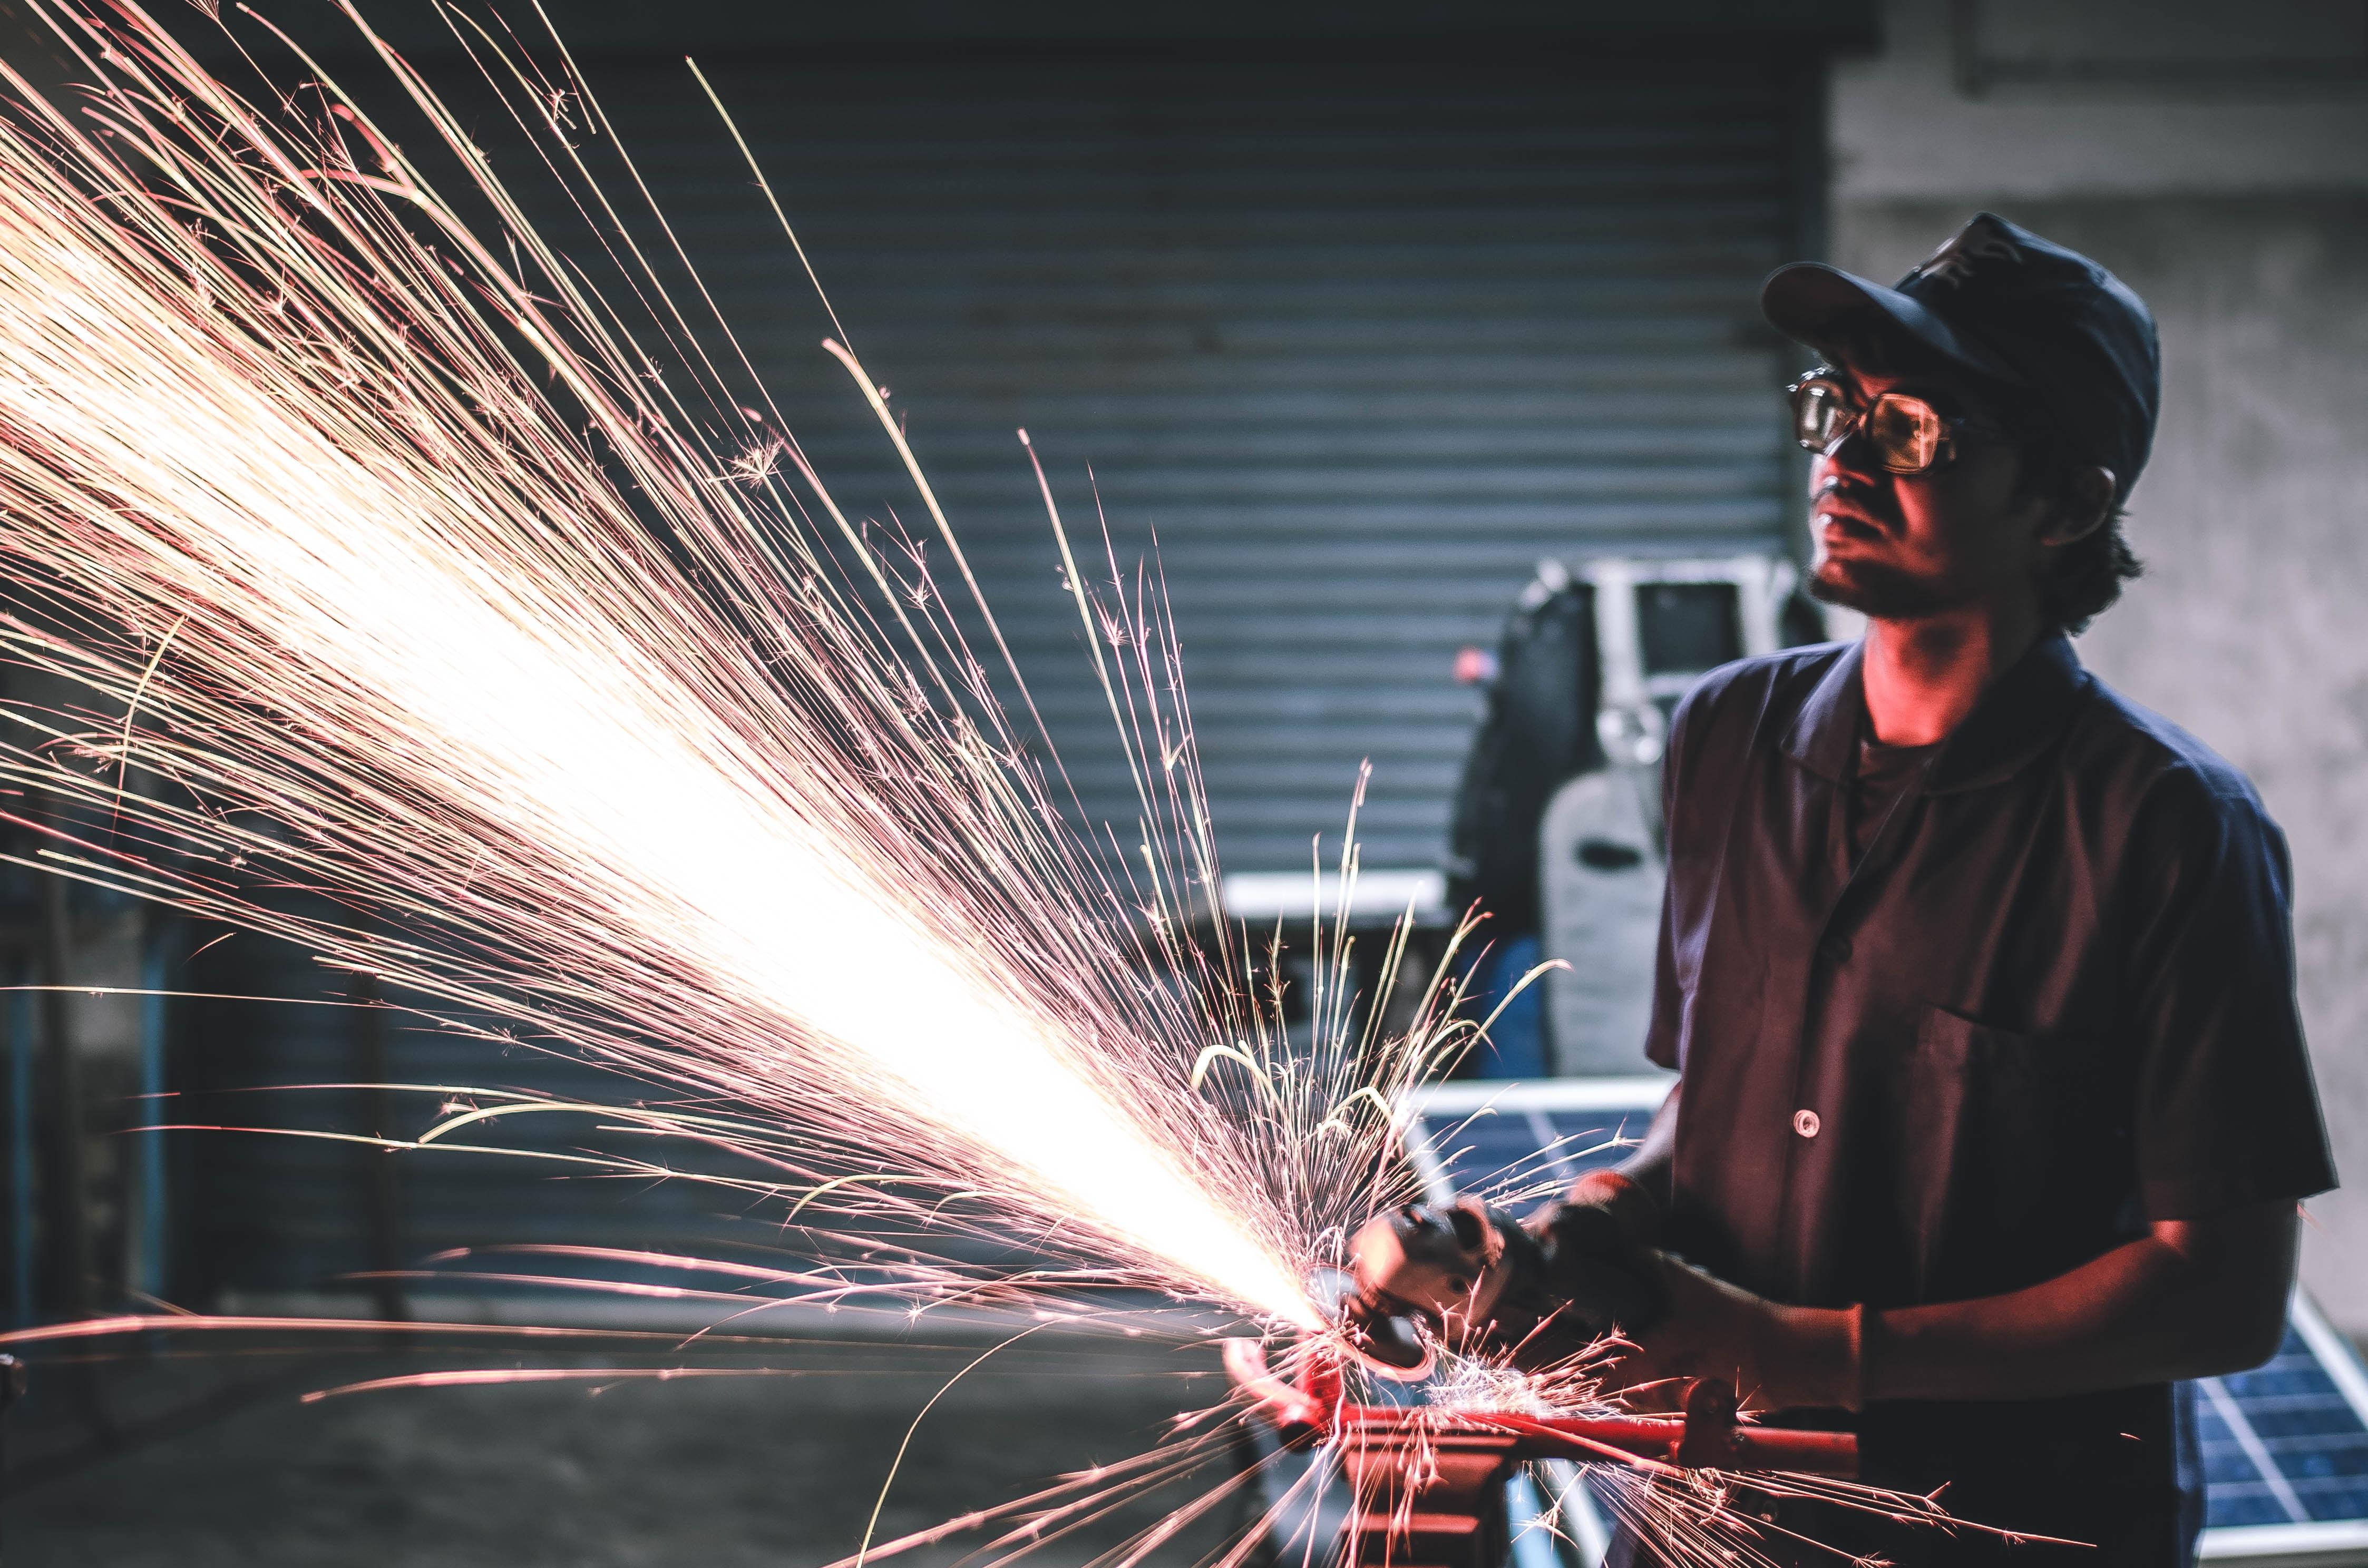 man in brown button-up shirt grinding metal